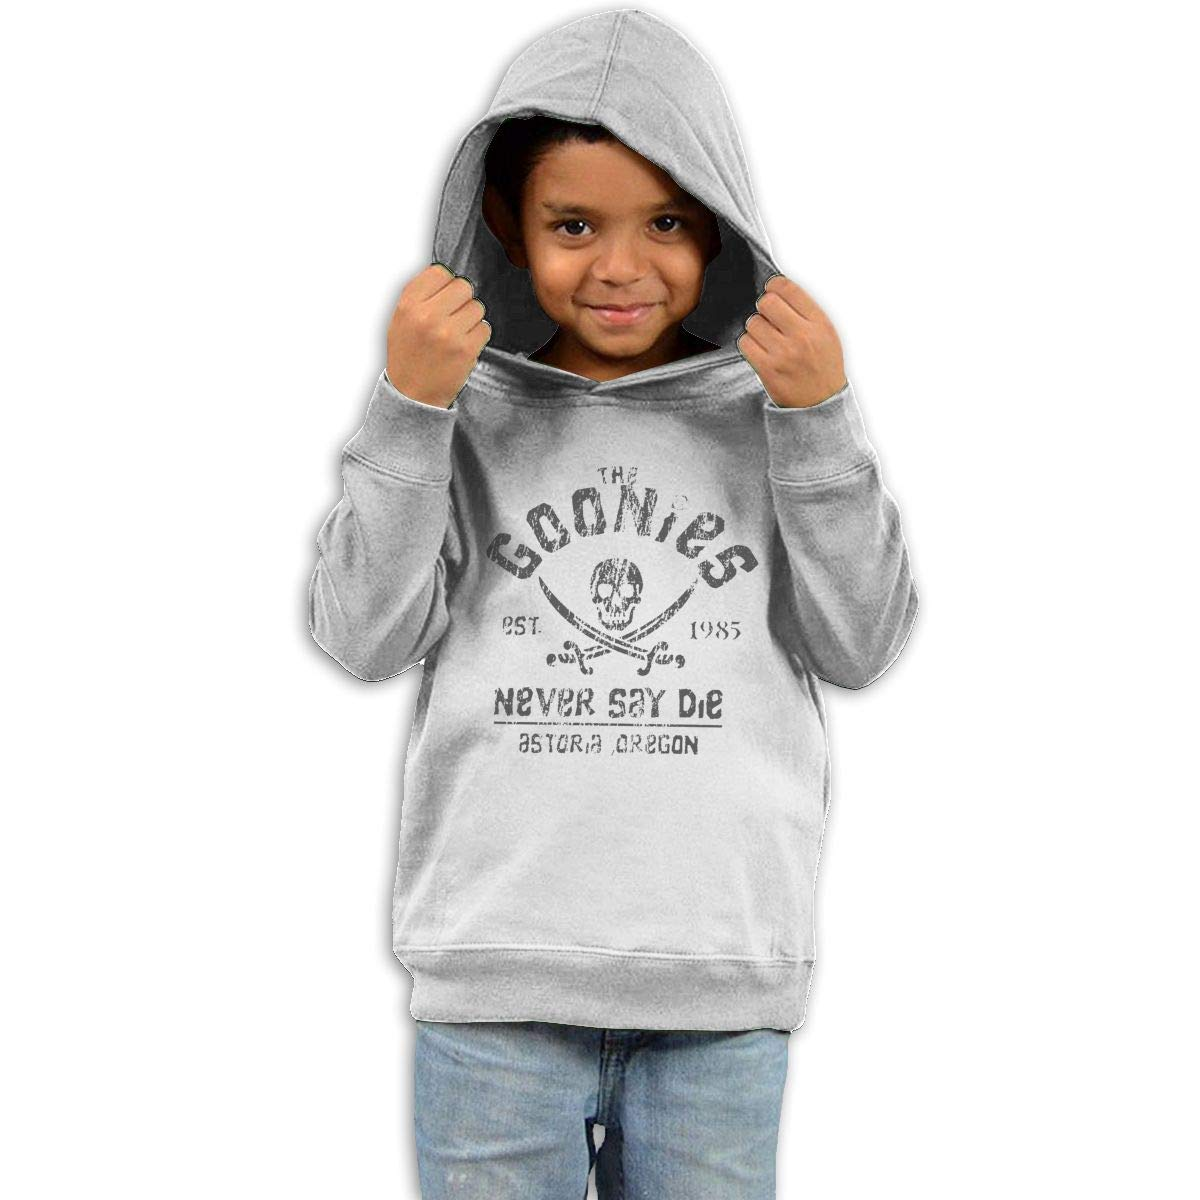 Stacy J. Payne Kids The Goonies - Never Say Die Funny Fleece41 White